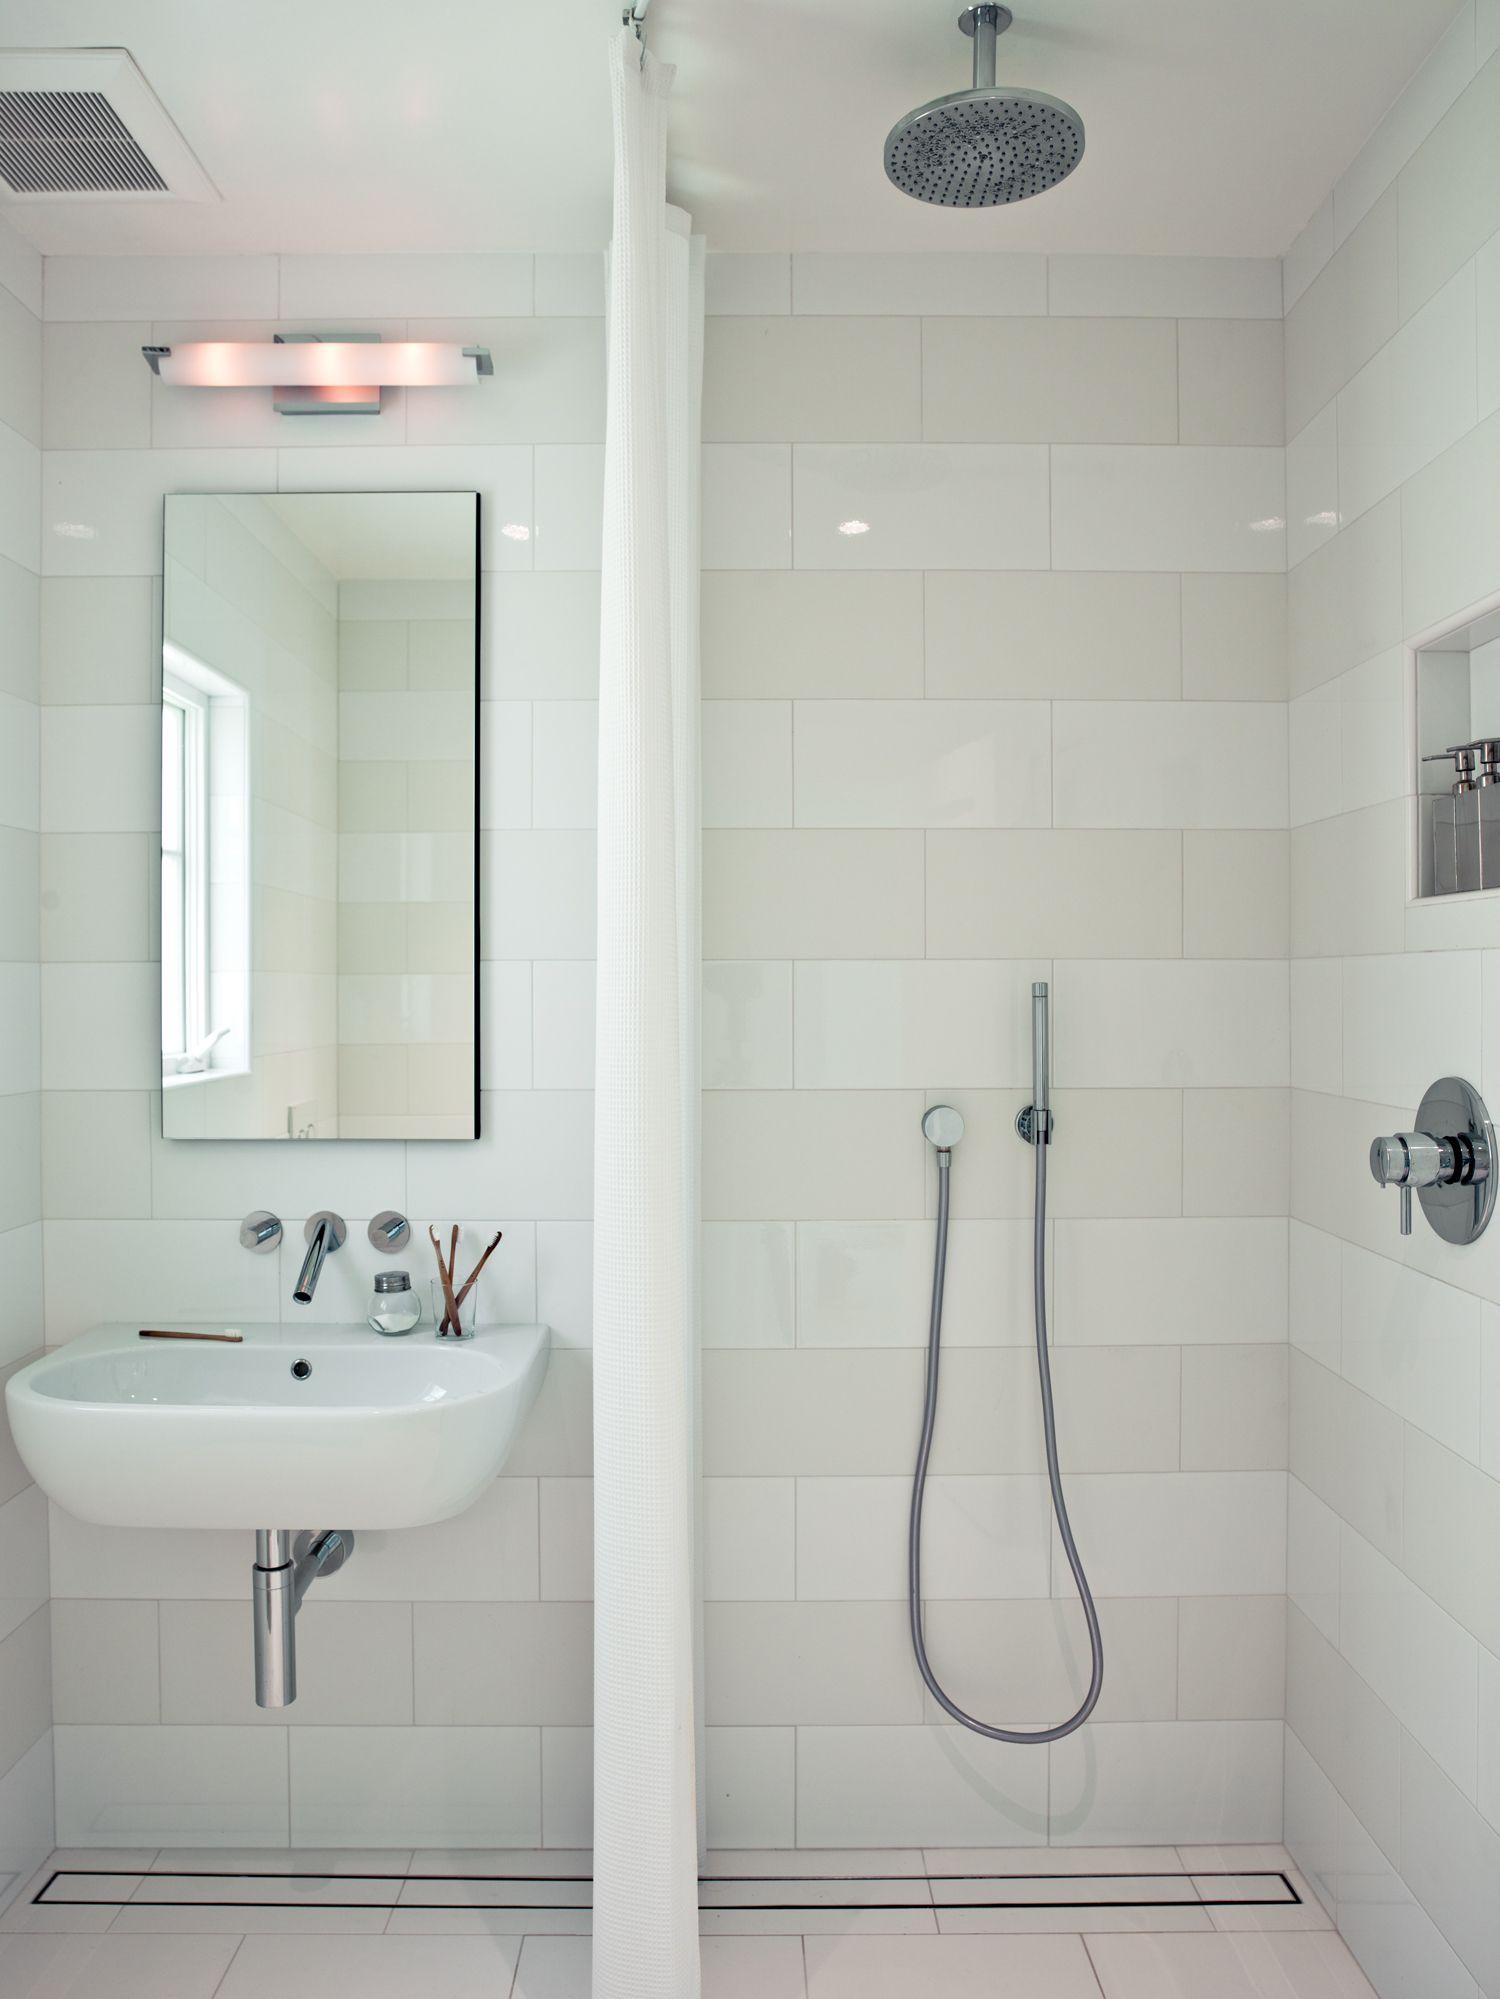 10 Stylish Bathroom Lighting Ideas   Bathrooms   Pinterest   White ...